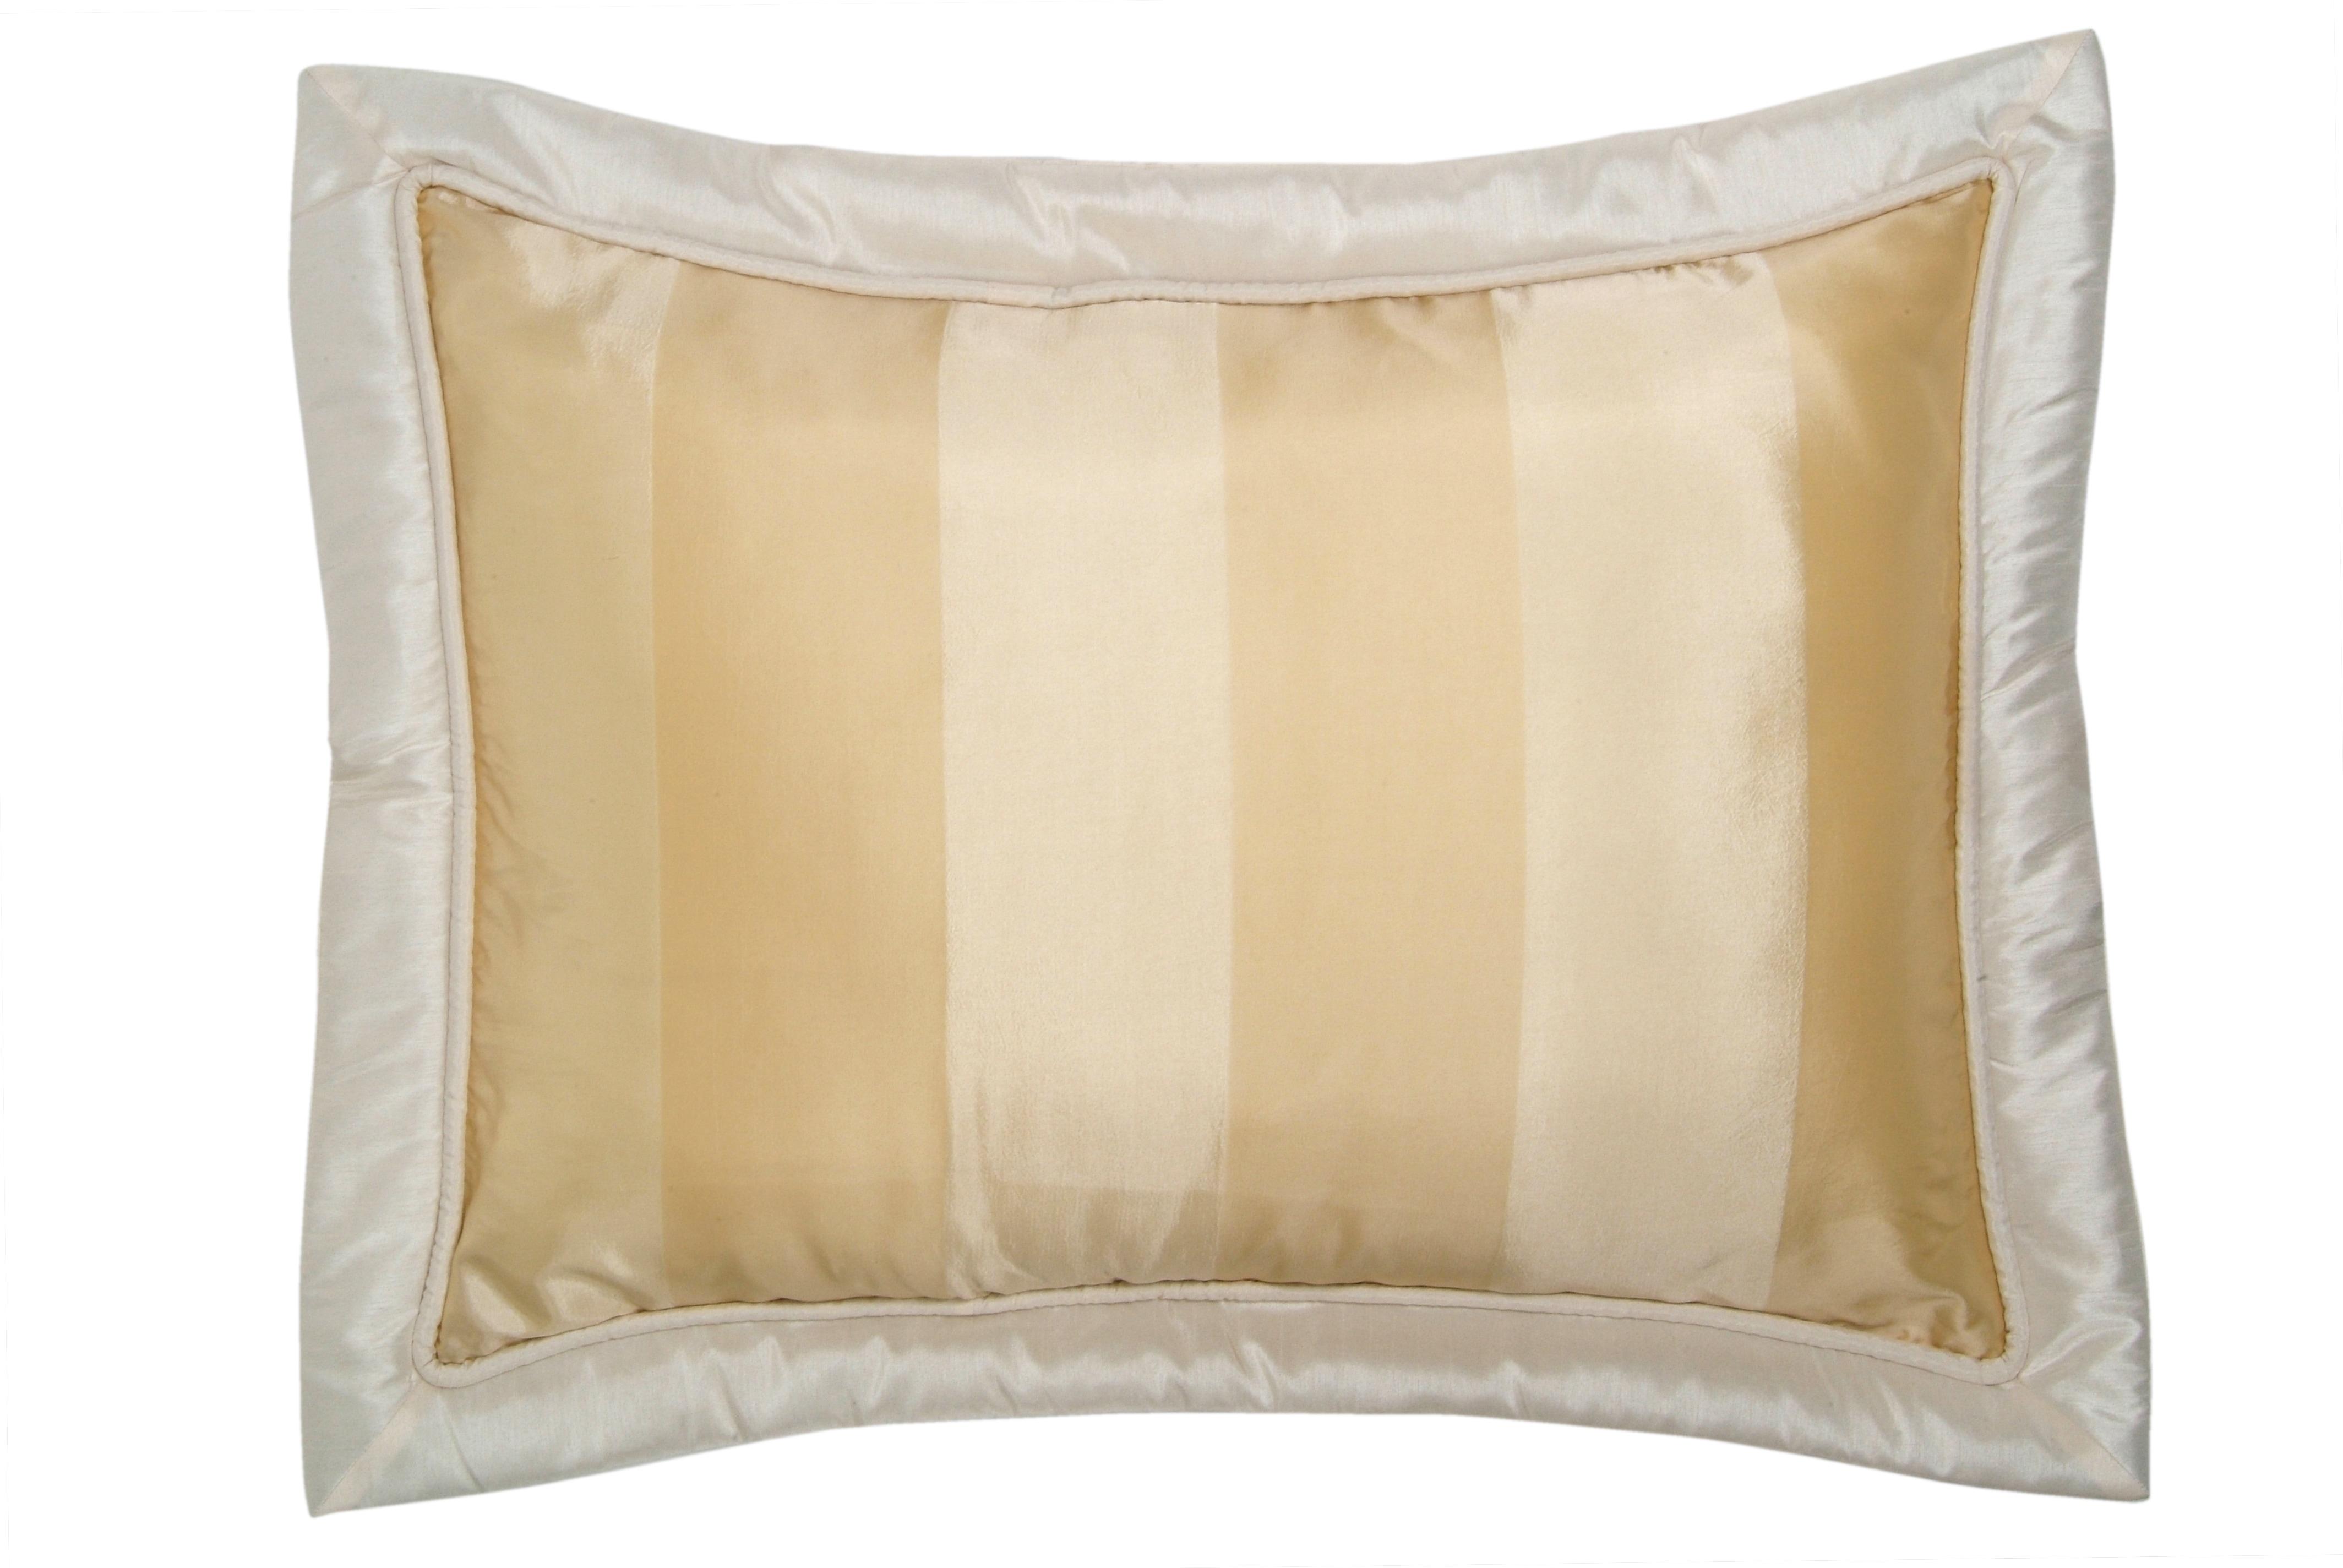 Jane Seymour Ivory Meadow Comforter 4-piece Set - Thumbnail 1